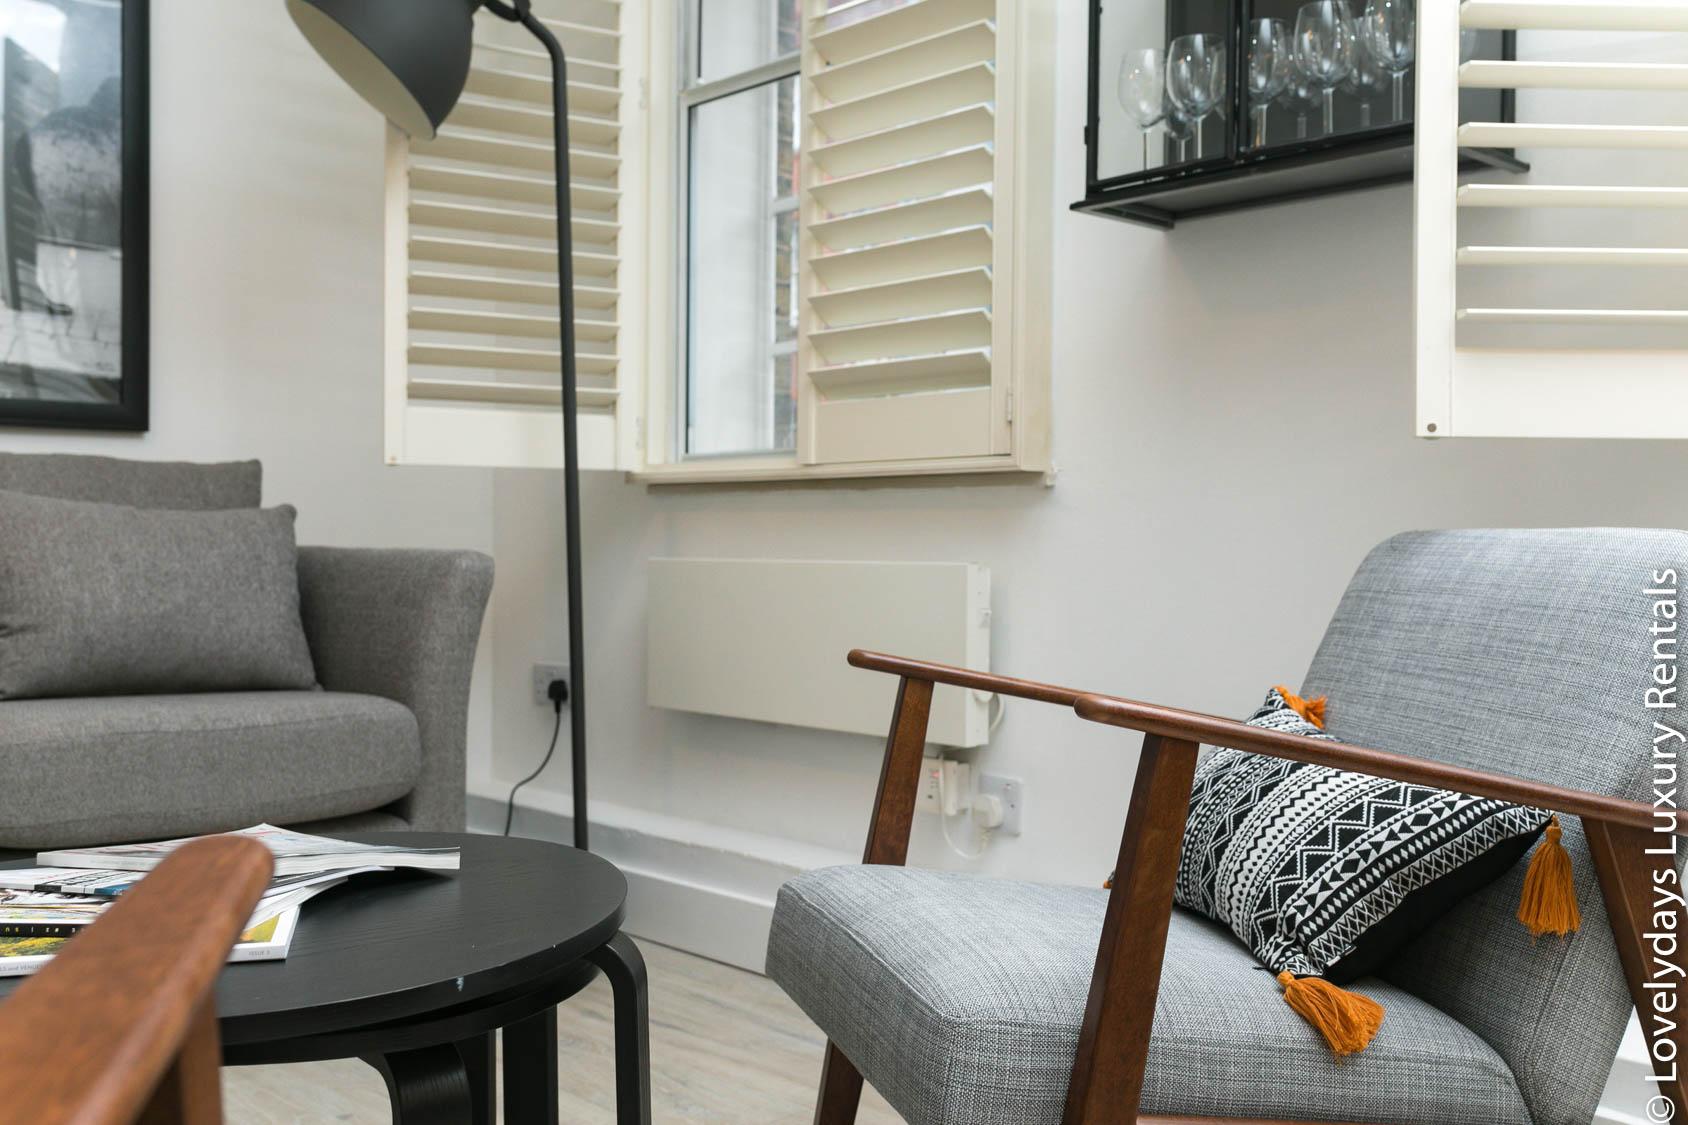 Lovelydays luxury service apartment rental - London - Fitzrovia - Goodge 55 - Lovelysuite - 2 bedrooms - 3 bathrooms - Luxury living room - 8818945a5744 - Lovelydays